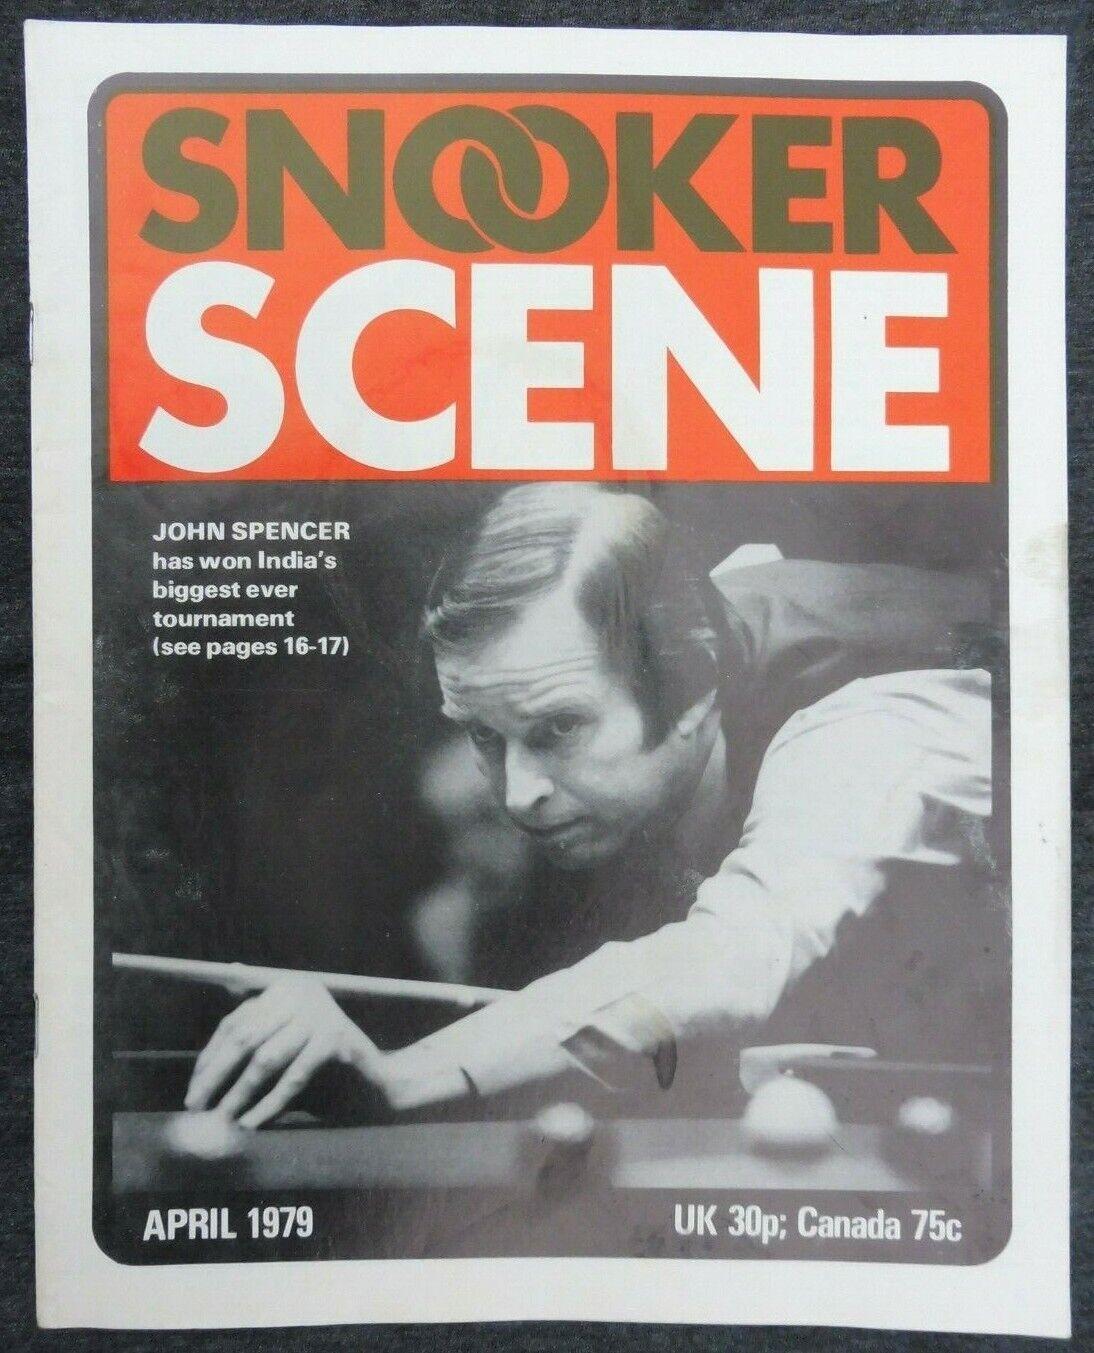 Snooker Scene Magazine, April 1979, Good Condition.